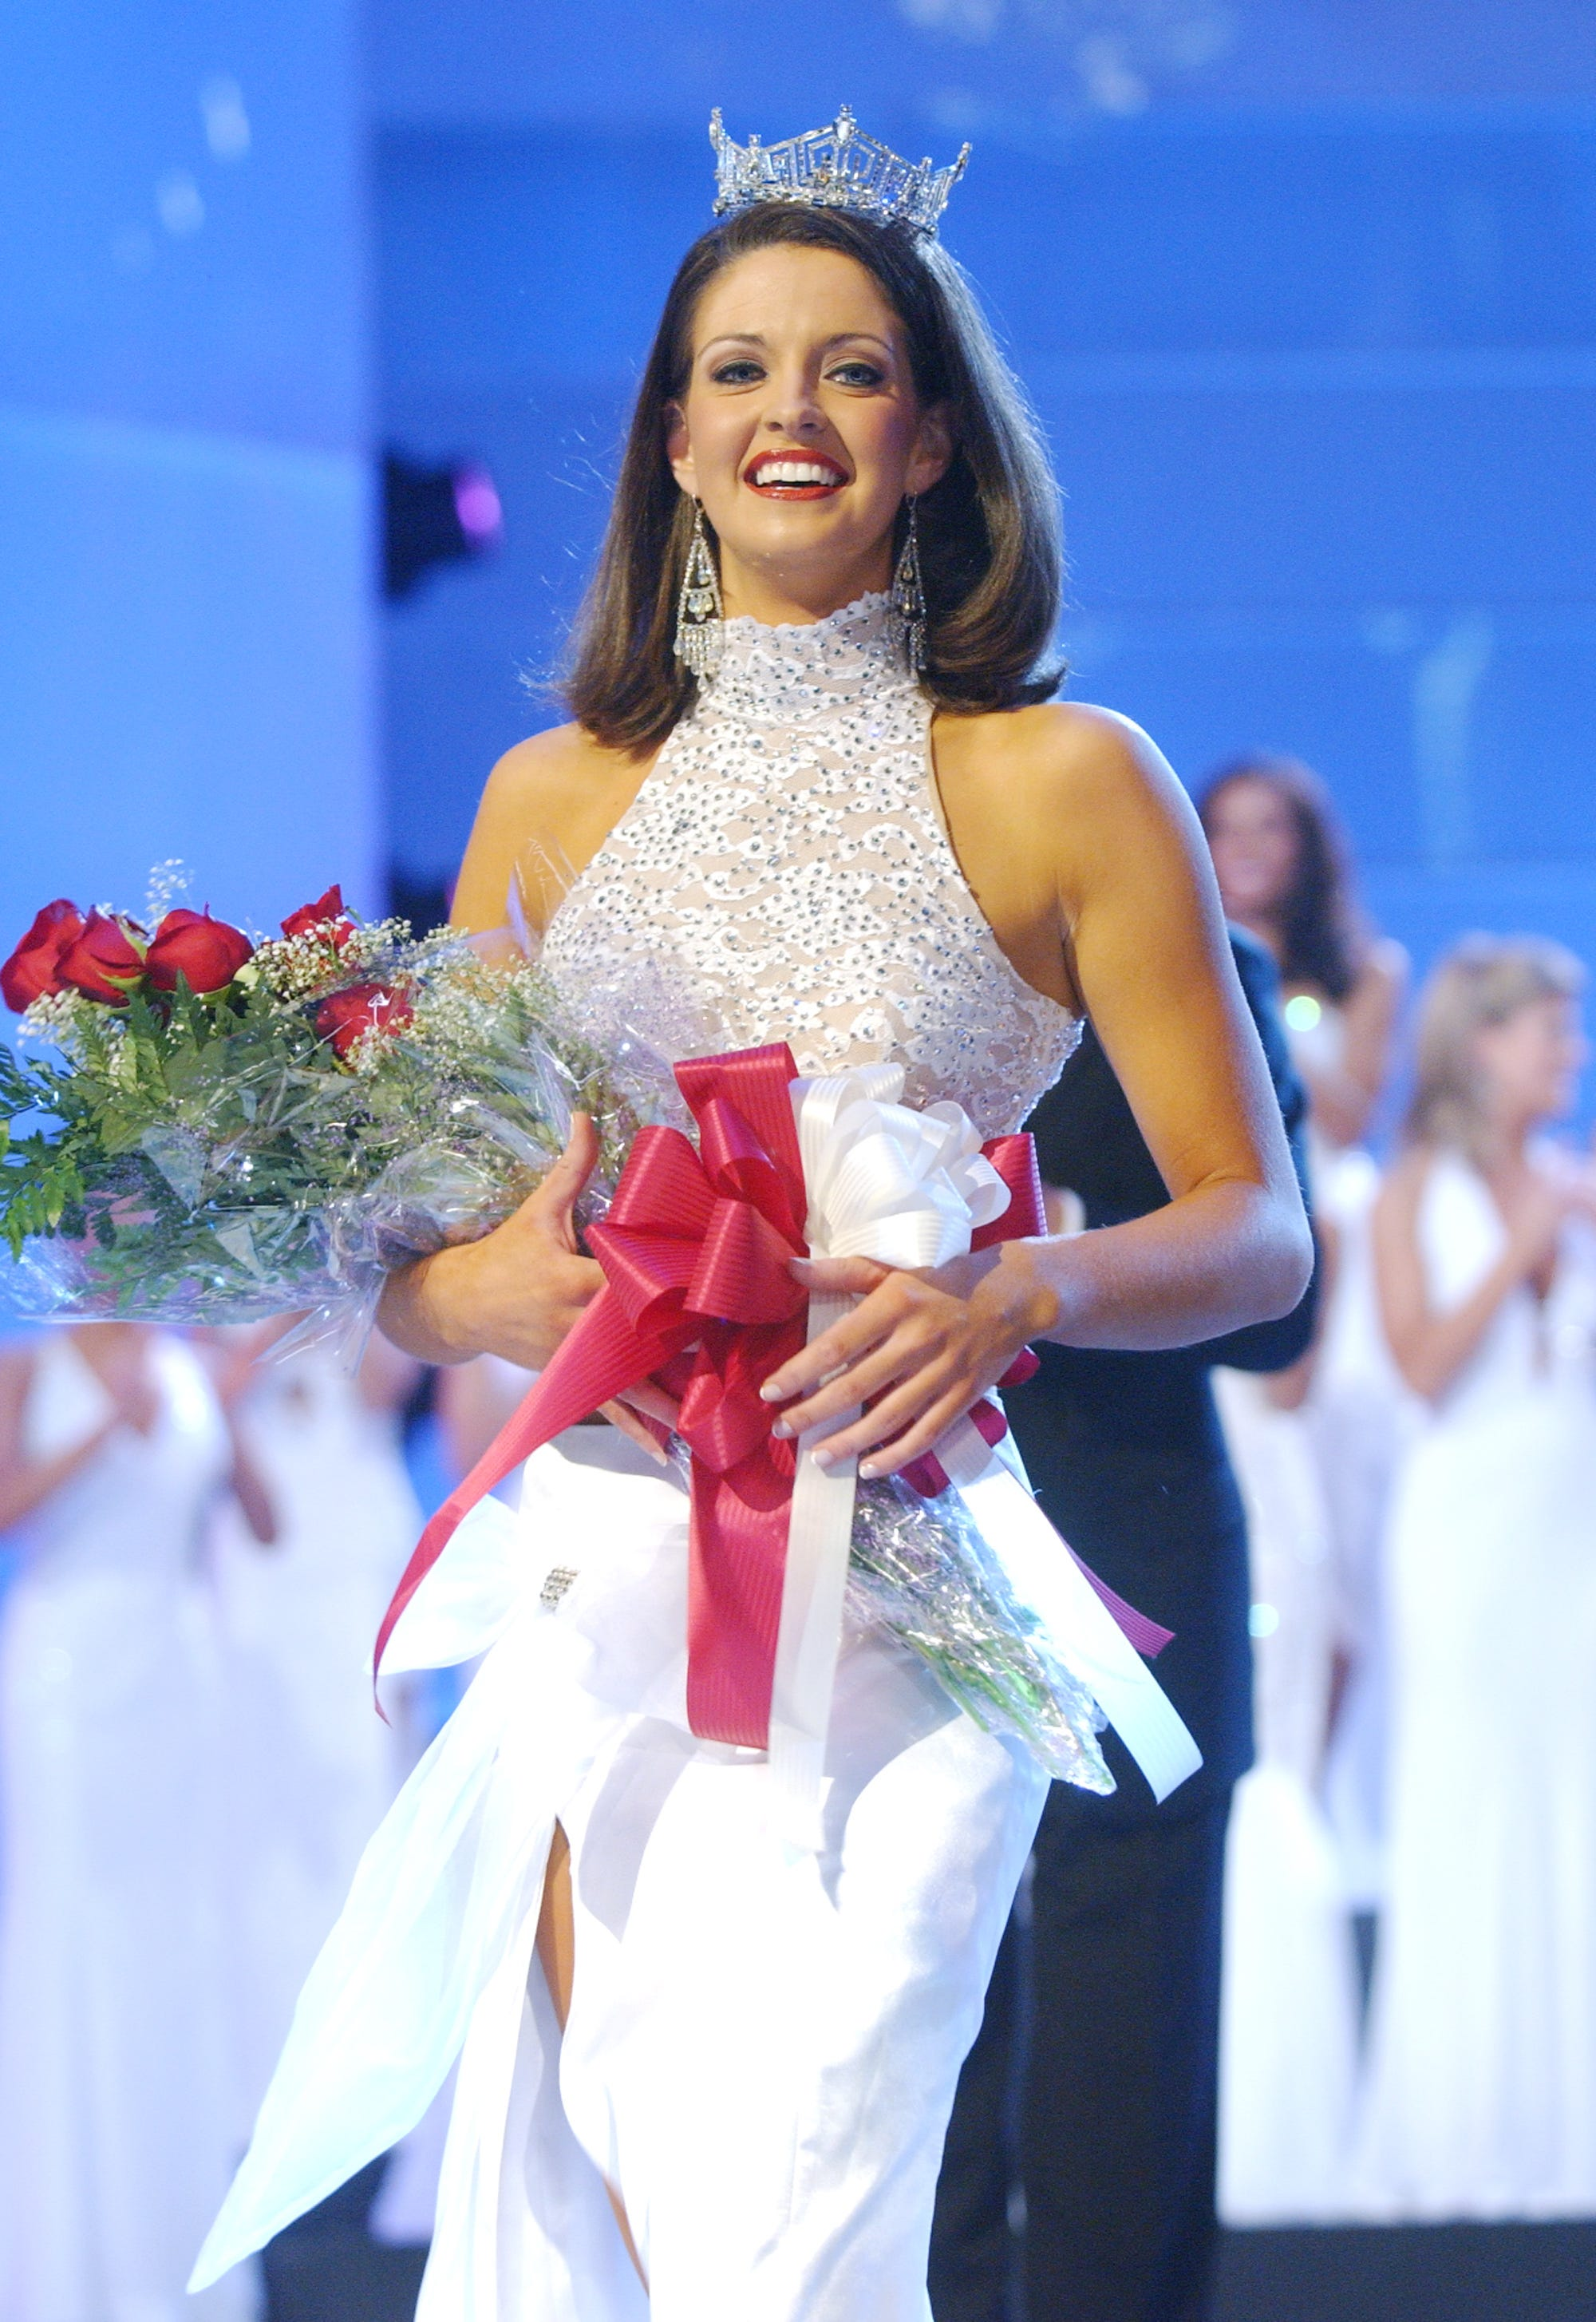 Former Miss America Deidre Downs Gunn marries same-sex partner in Alabama wedding | Burlington Free Press